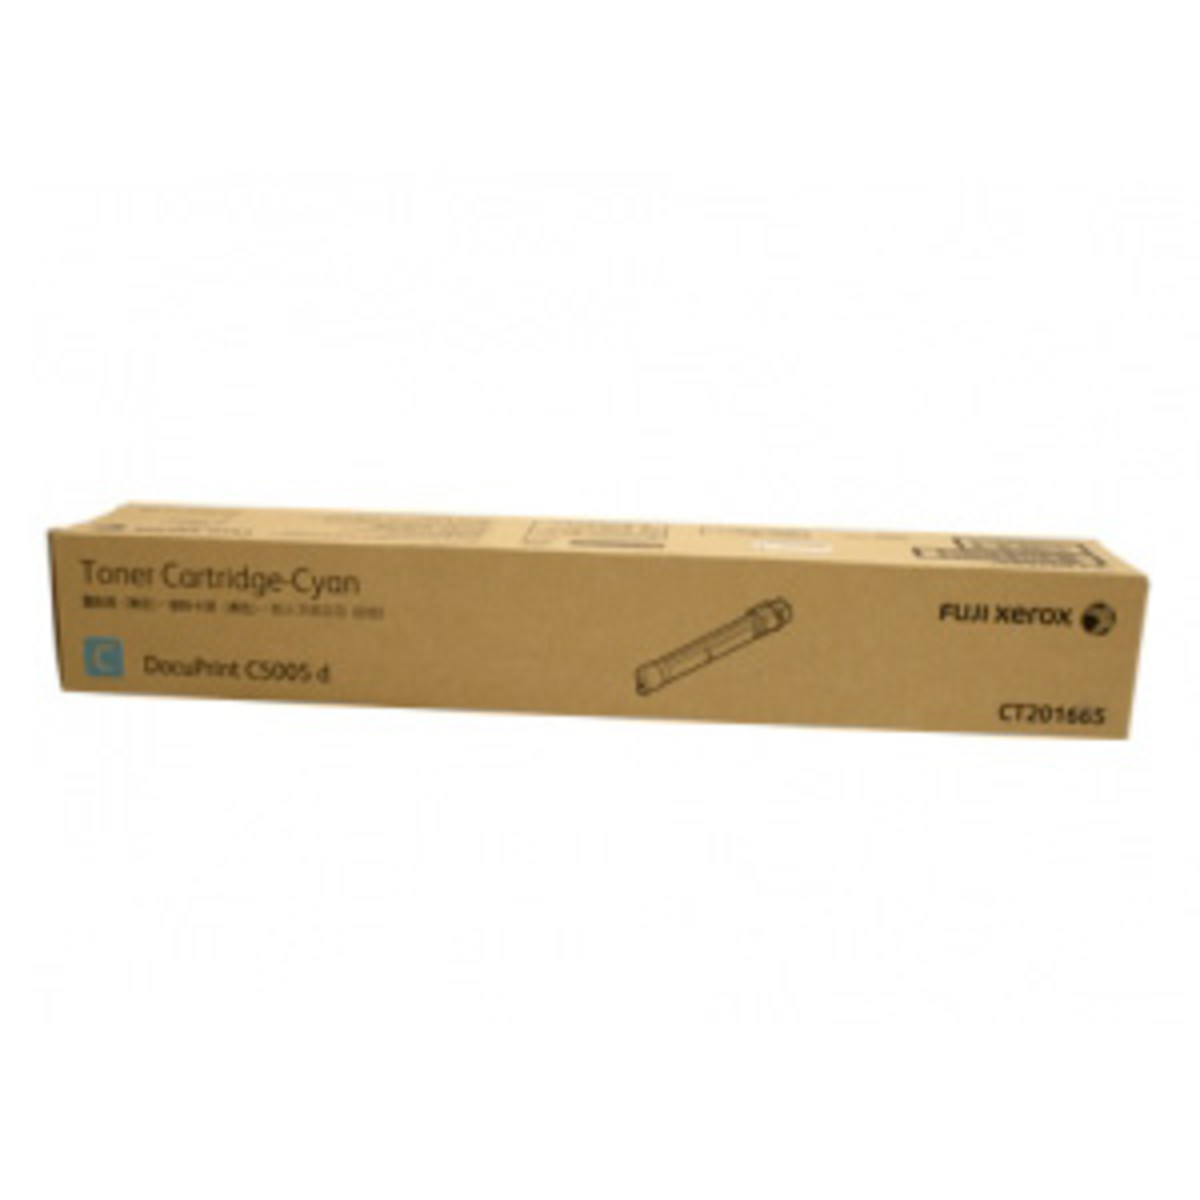 Xerox CT201665 Cyan Toner Cartridge